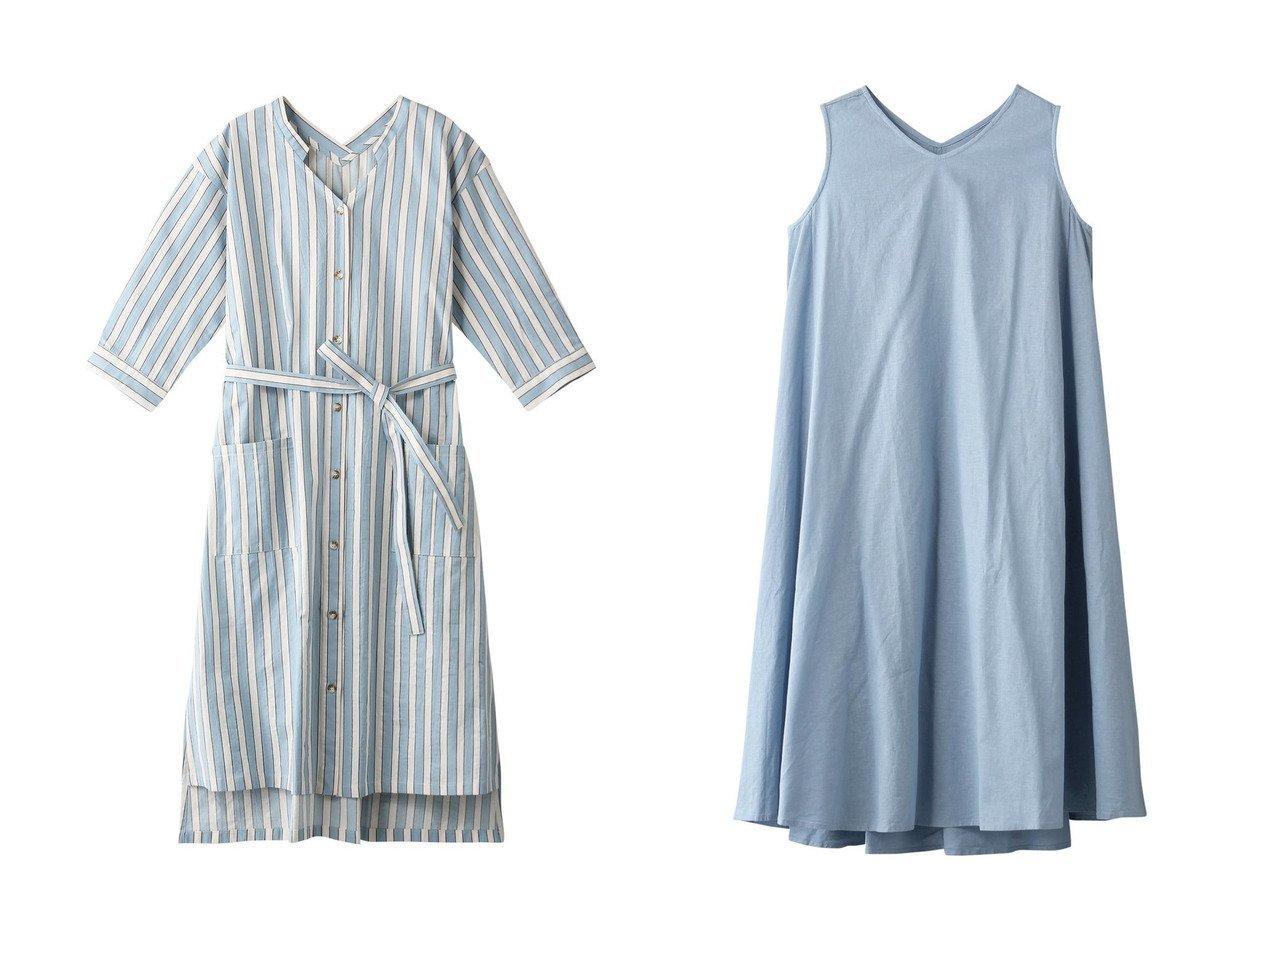 【KID BLUE/キッドブルー】の21ワッシャーストライプワンピース&21ボタニカルリネンワンピース 【ワンピース・ドレス】おすすめ!人気、トレンド・レディースファッションの通販 おすすめで人気の流行・トレンド、ファッションの通販商品 インテリア・家具・メンズファッション・キッズファッション・レディースファッション・服の通販 founy(ファニー) https://founy.com/ ファッション Fashion レディースファッション WOMEN ワンピース Dress S/S・春夏 SS・Spring/Summer ストライプ スリット リボン 春 Spring  ID:crp329100000040346